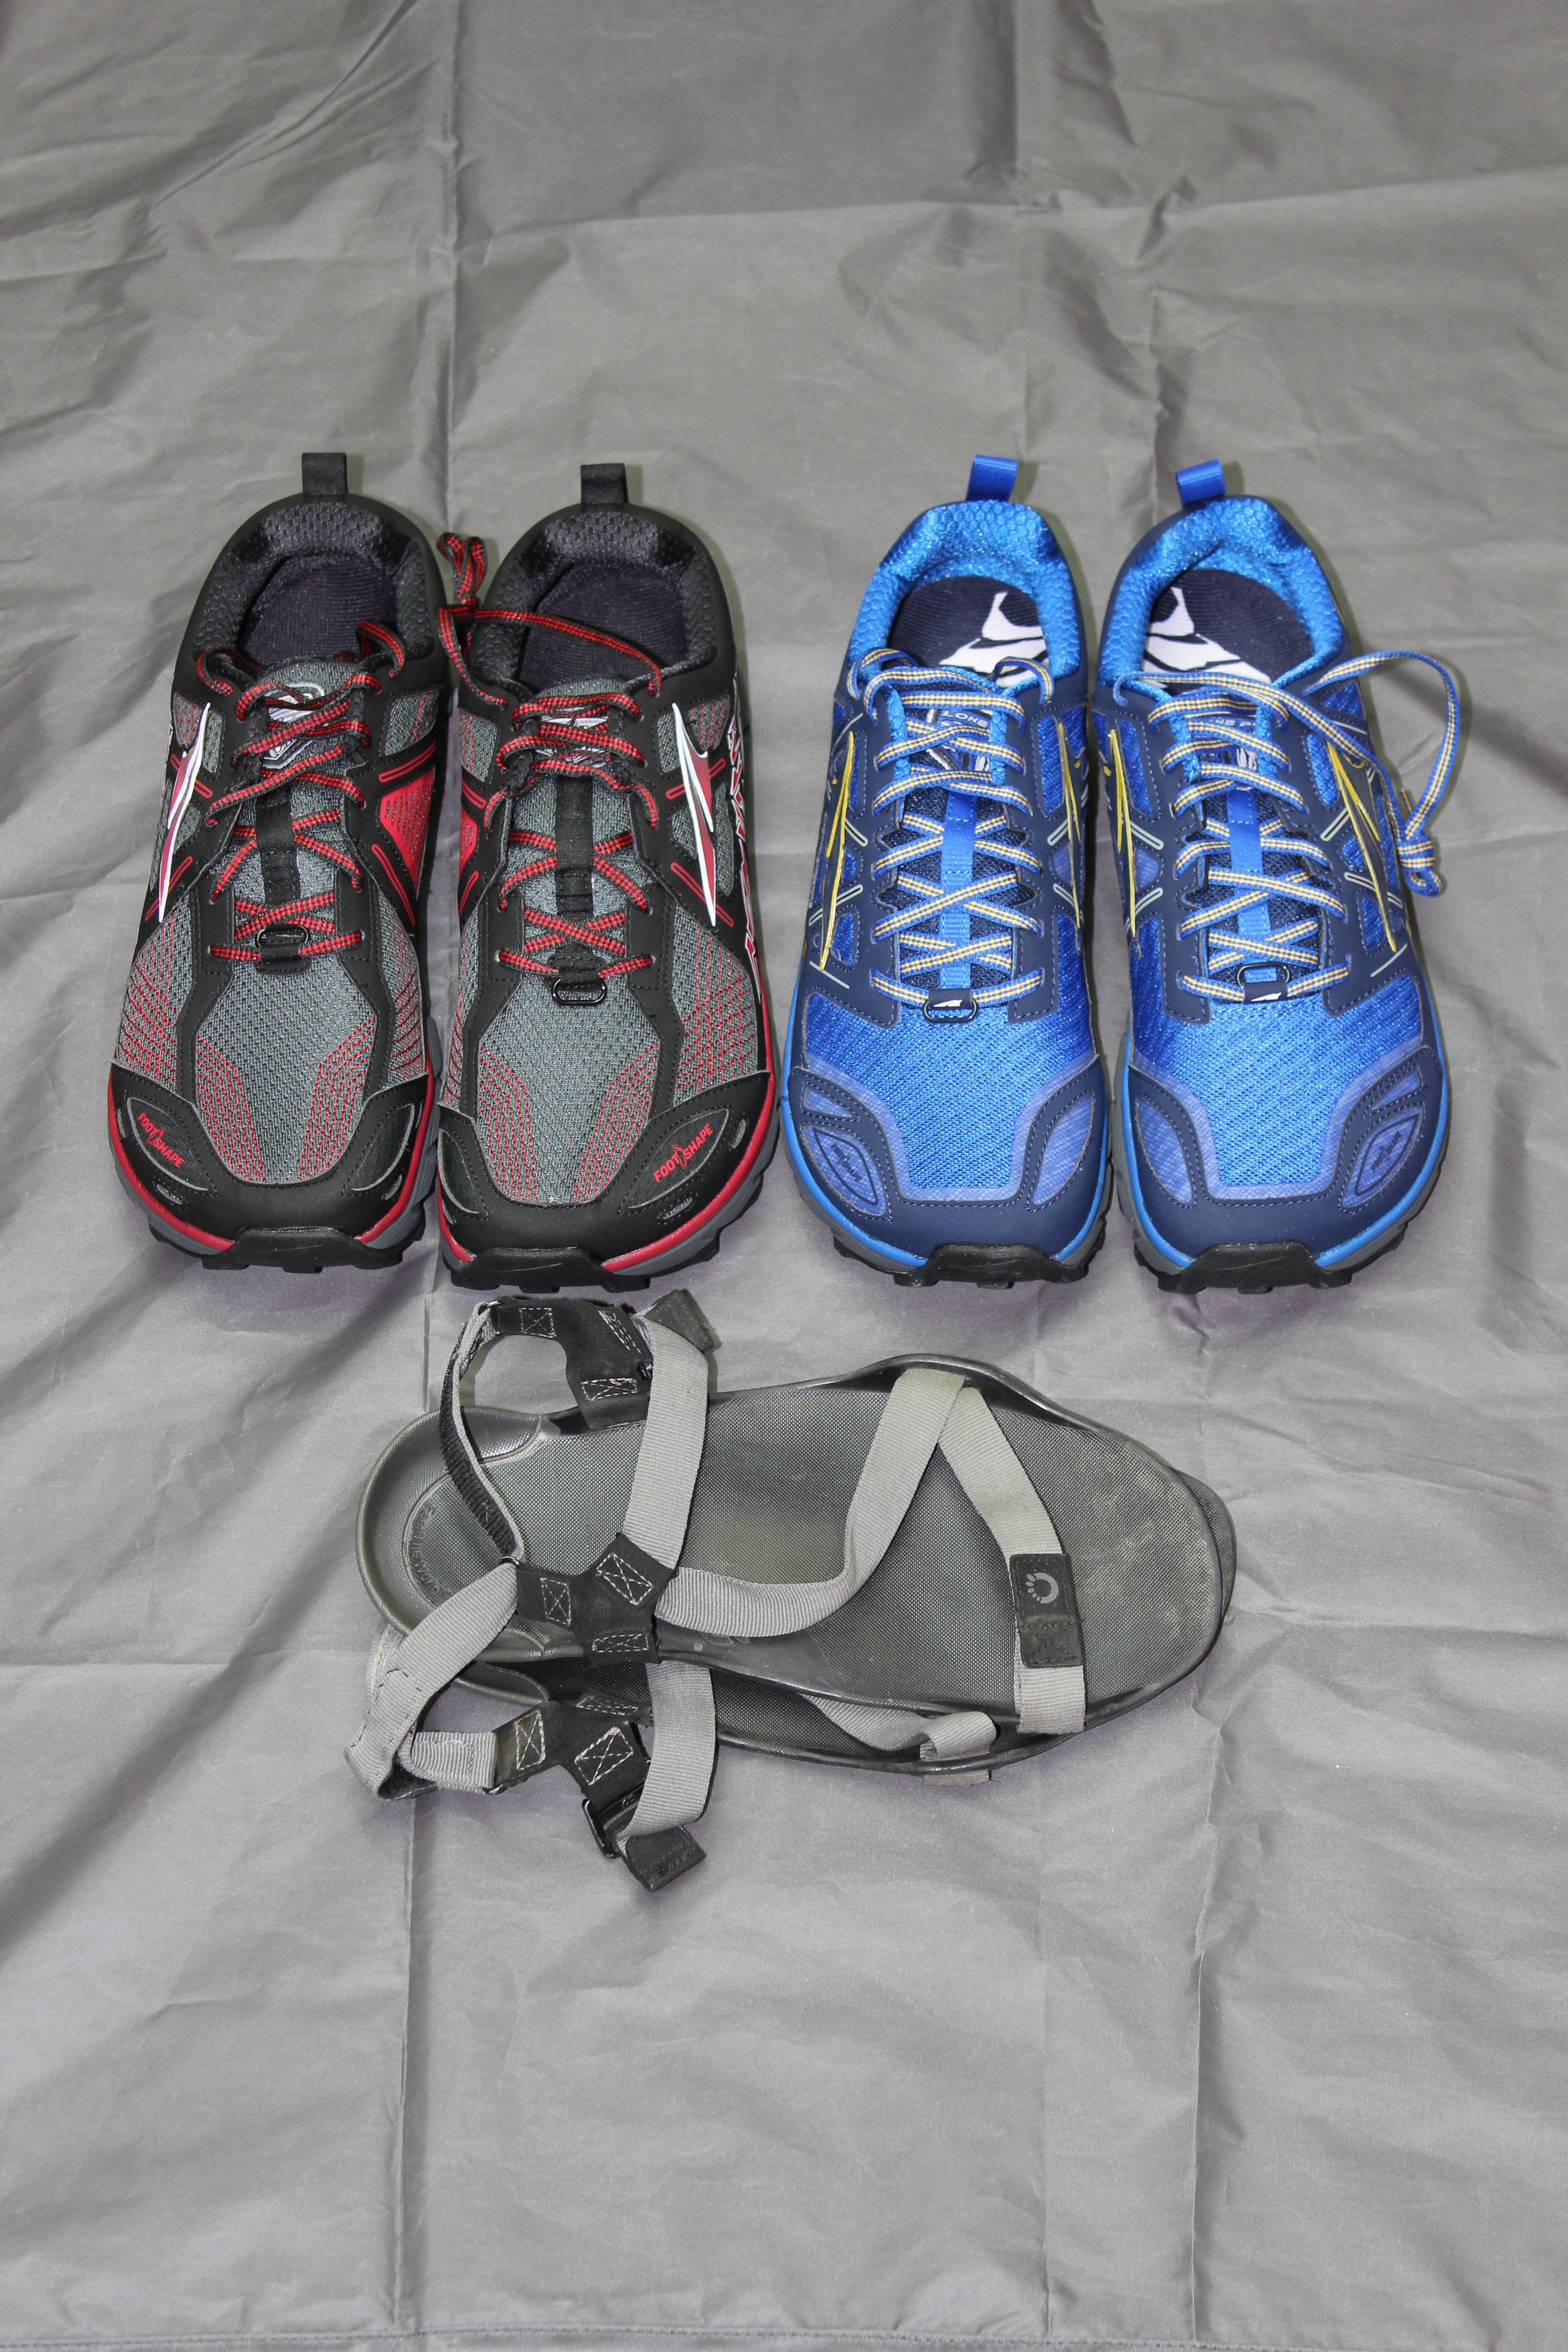 Altra Lone Peak 3.0 and 3.5  Xero Sandals